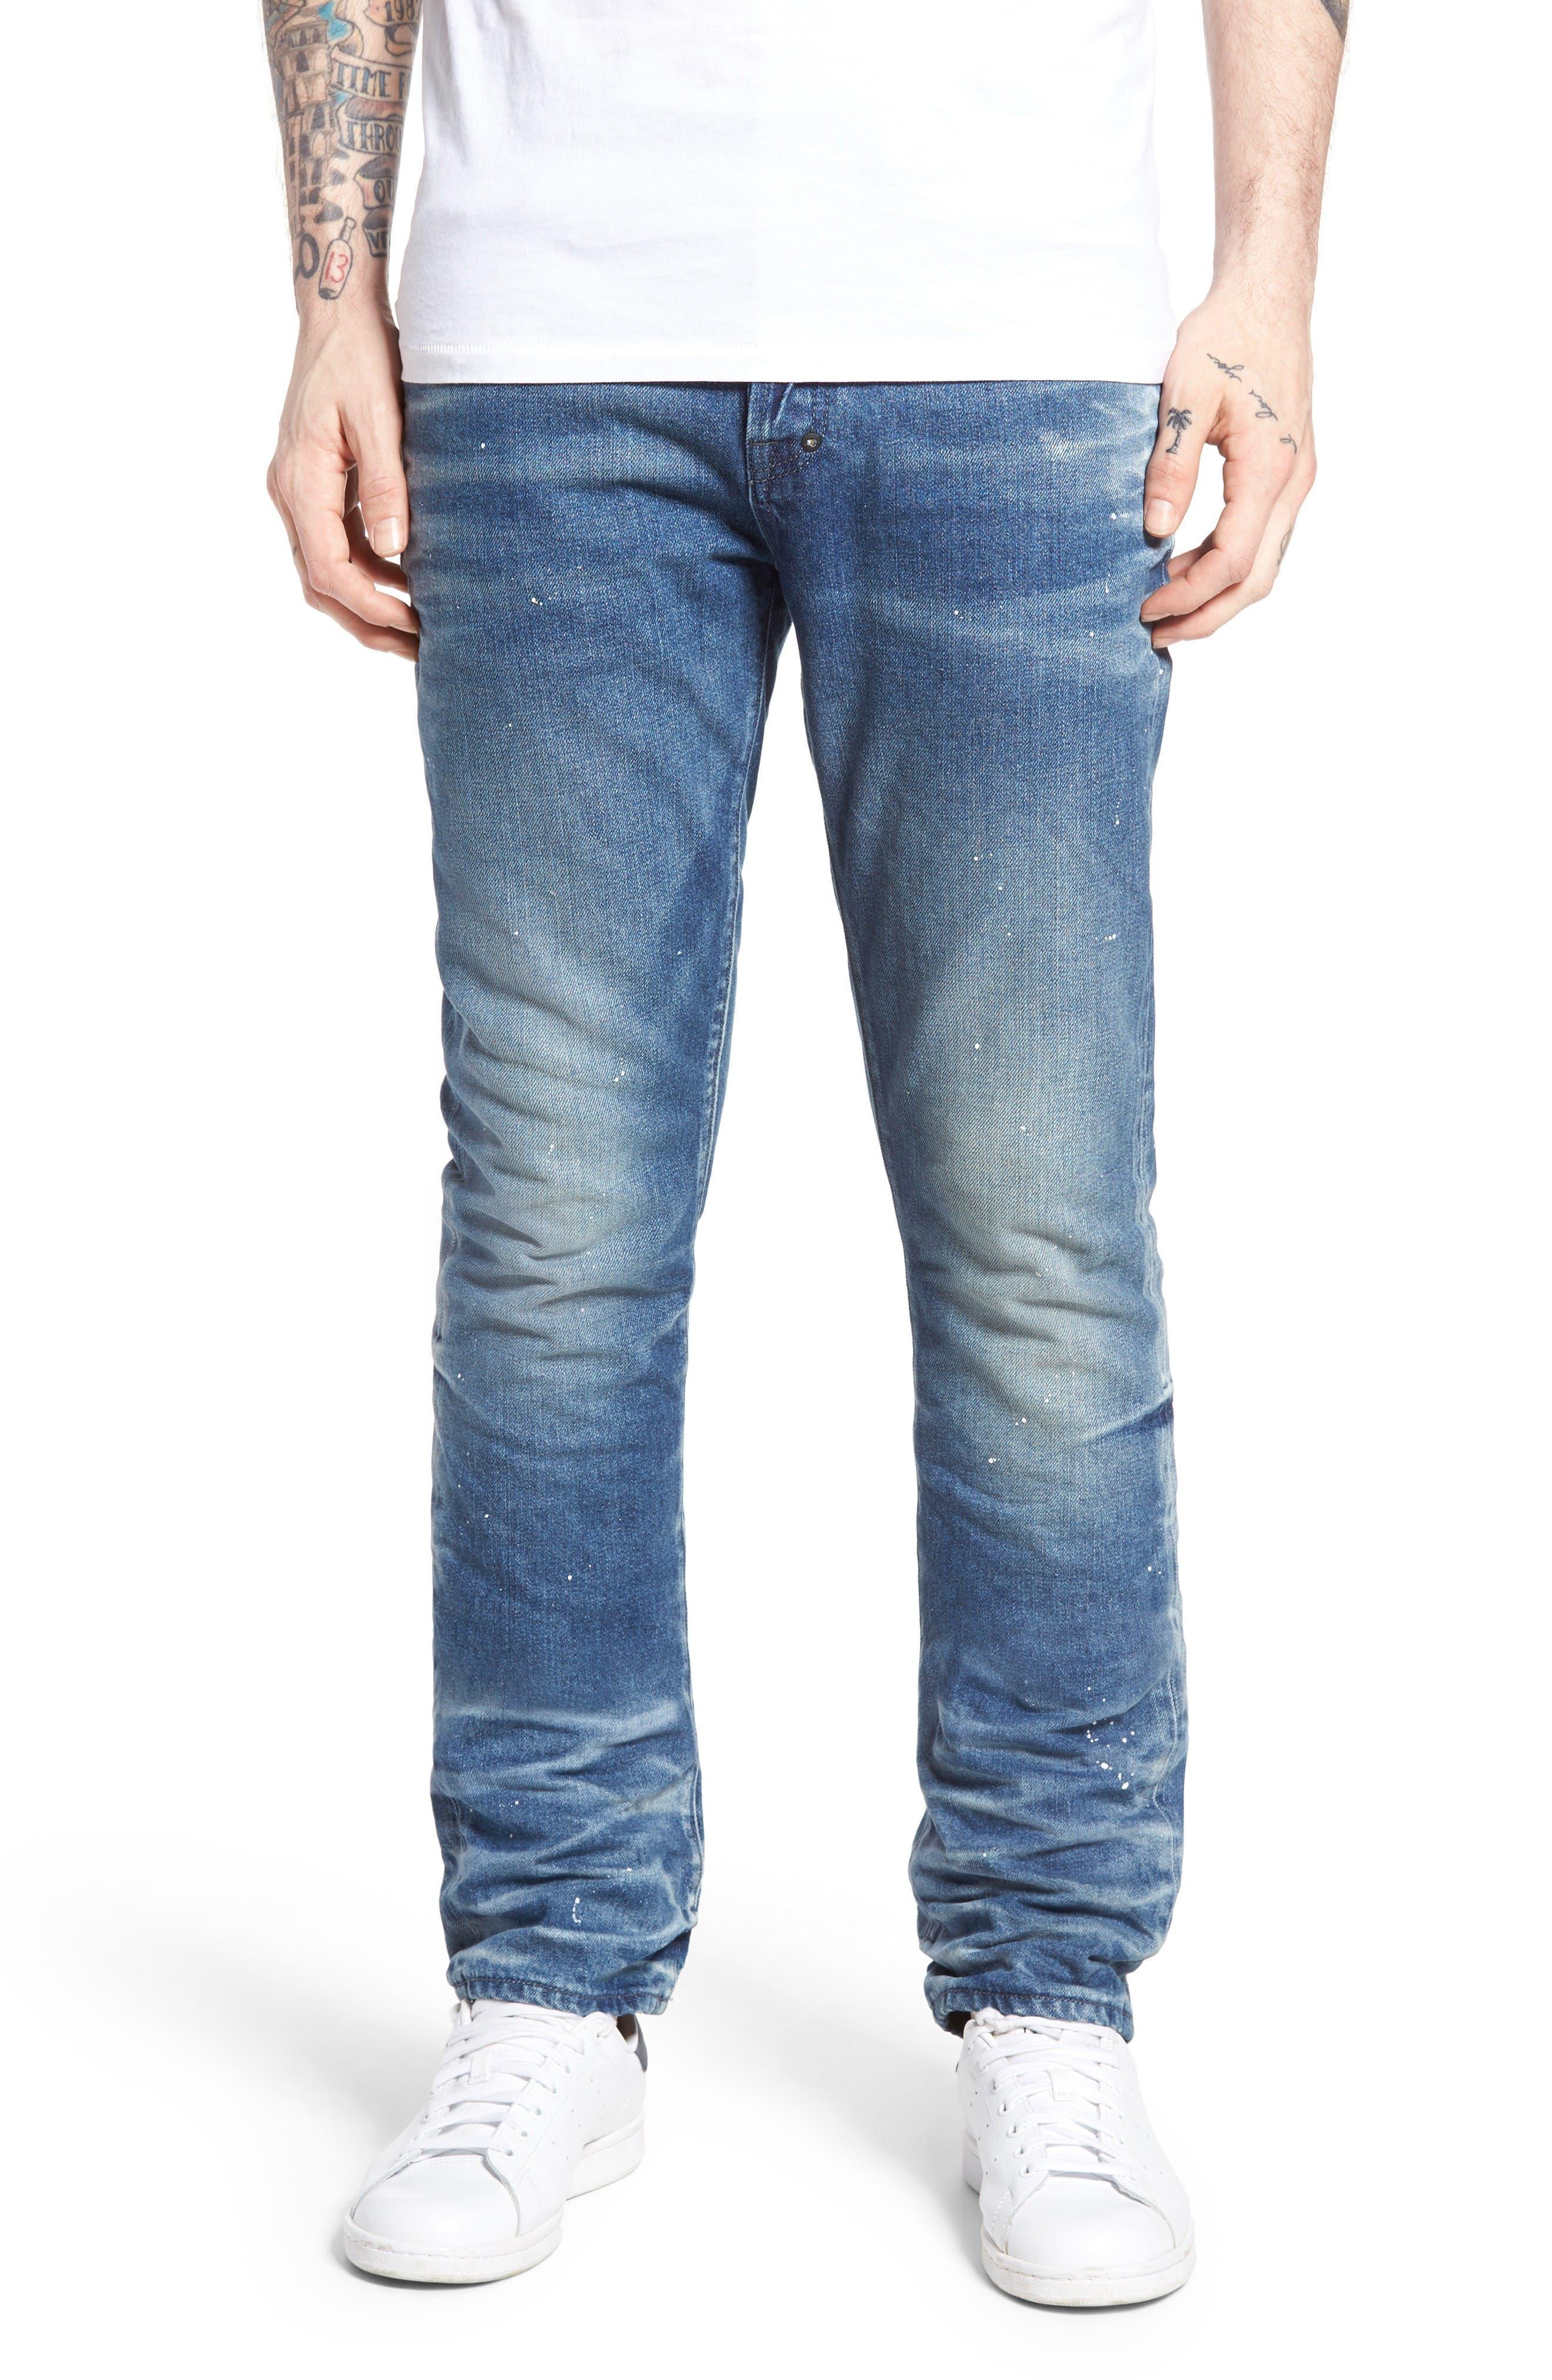 Demon Slim Straight Leg Jeans,                             Main thumbnail 1, color,                             Mediam